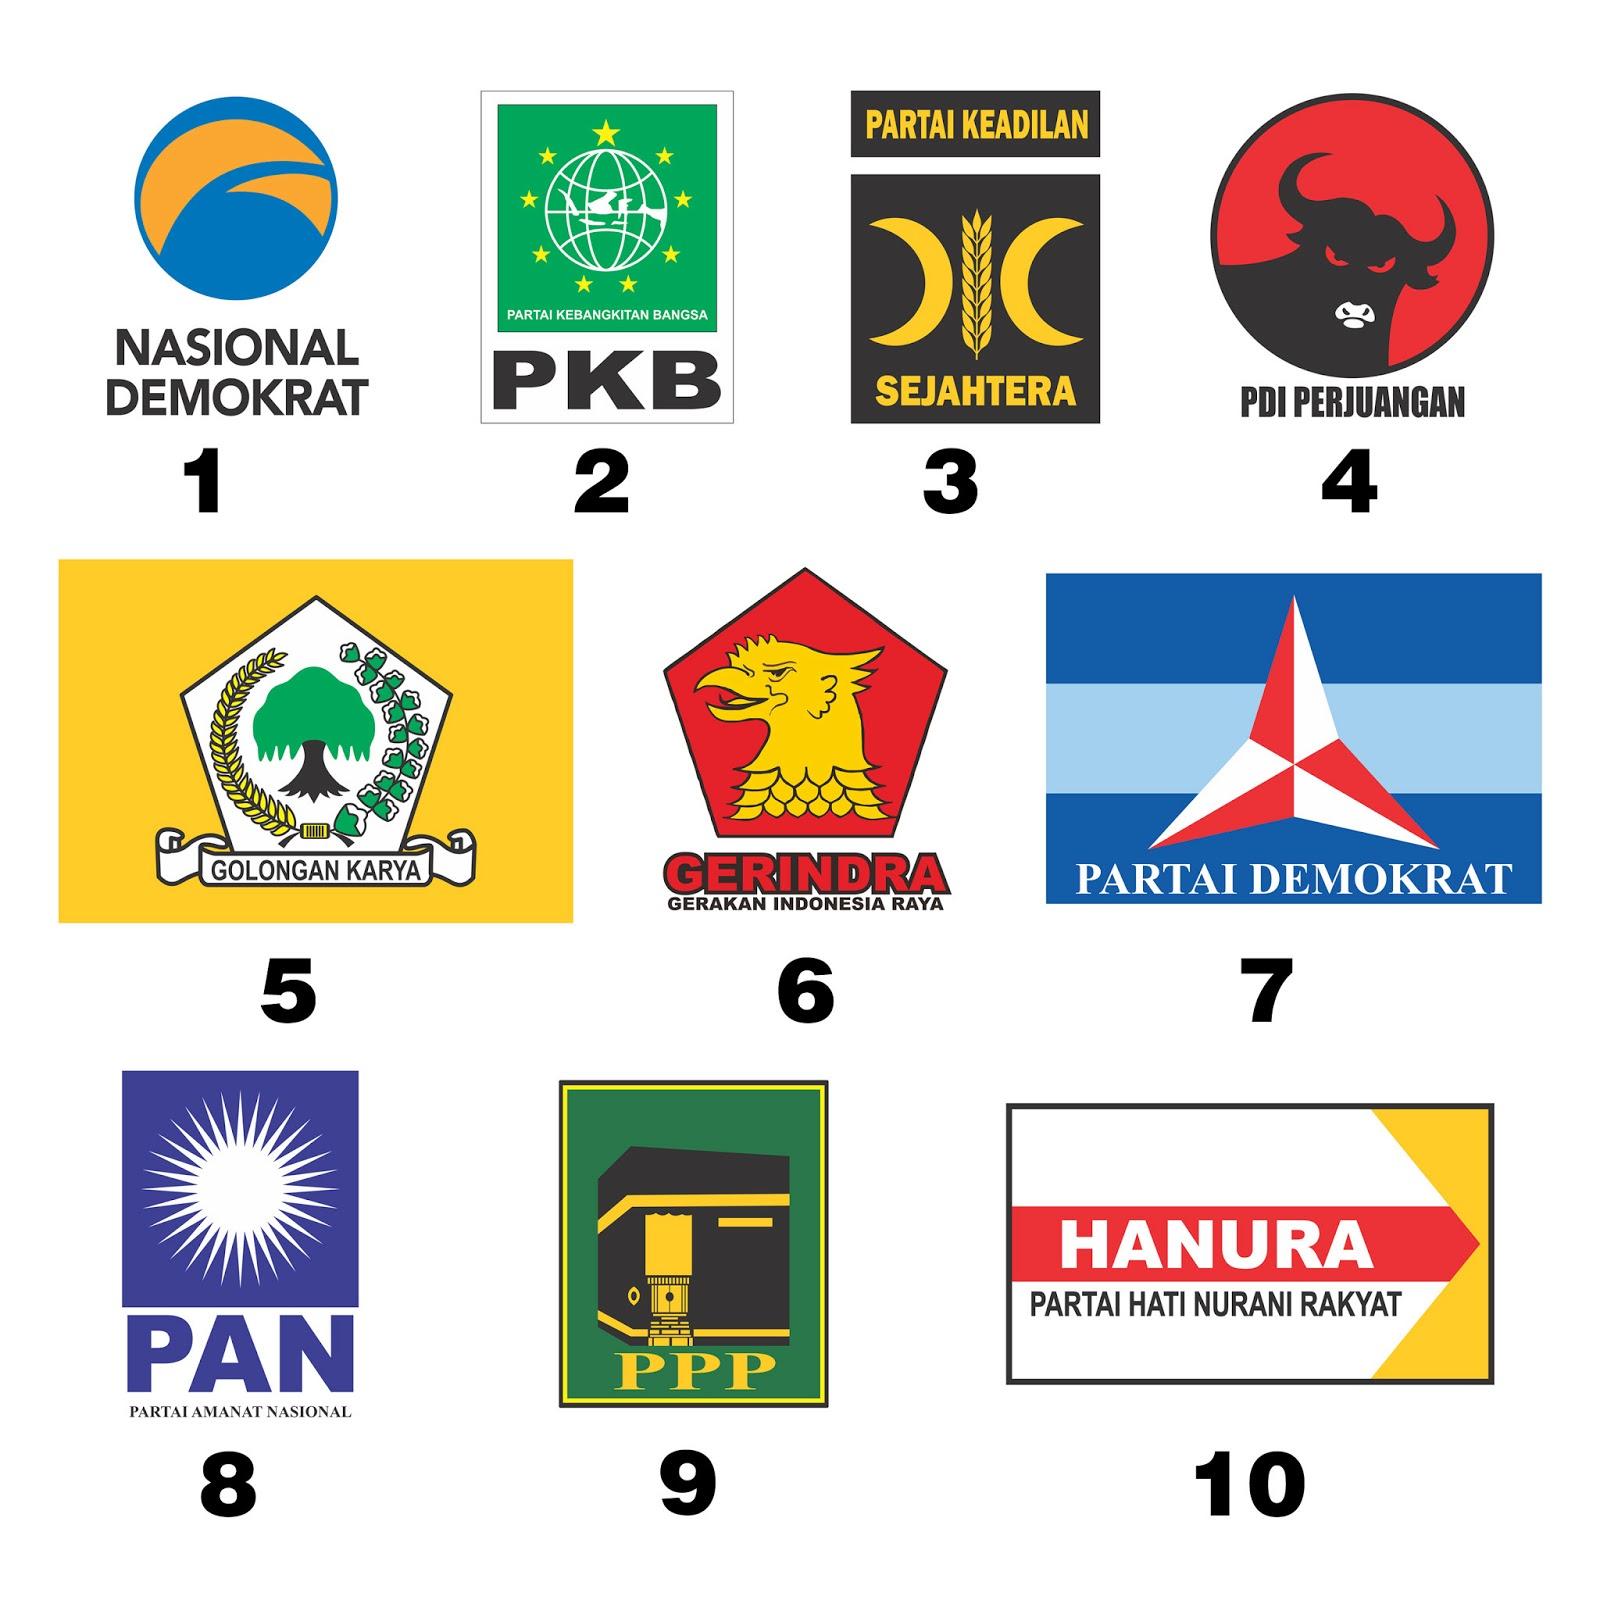 Download Logo Vector Partai Politik (PARPOL) Peserta PEMILU 2014 - Aryo  Widiantoko 3a2d64e8c8